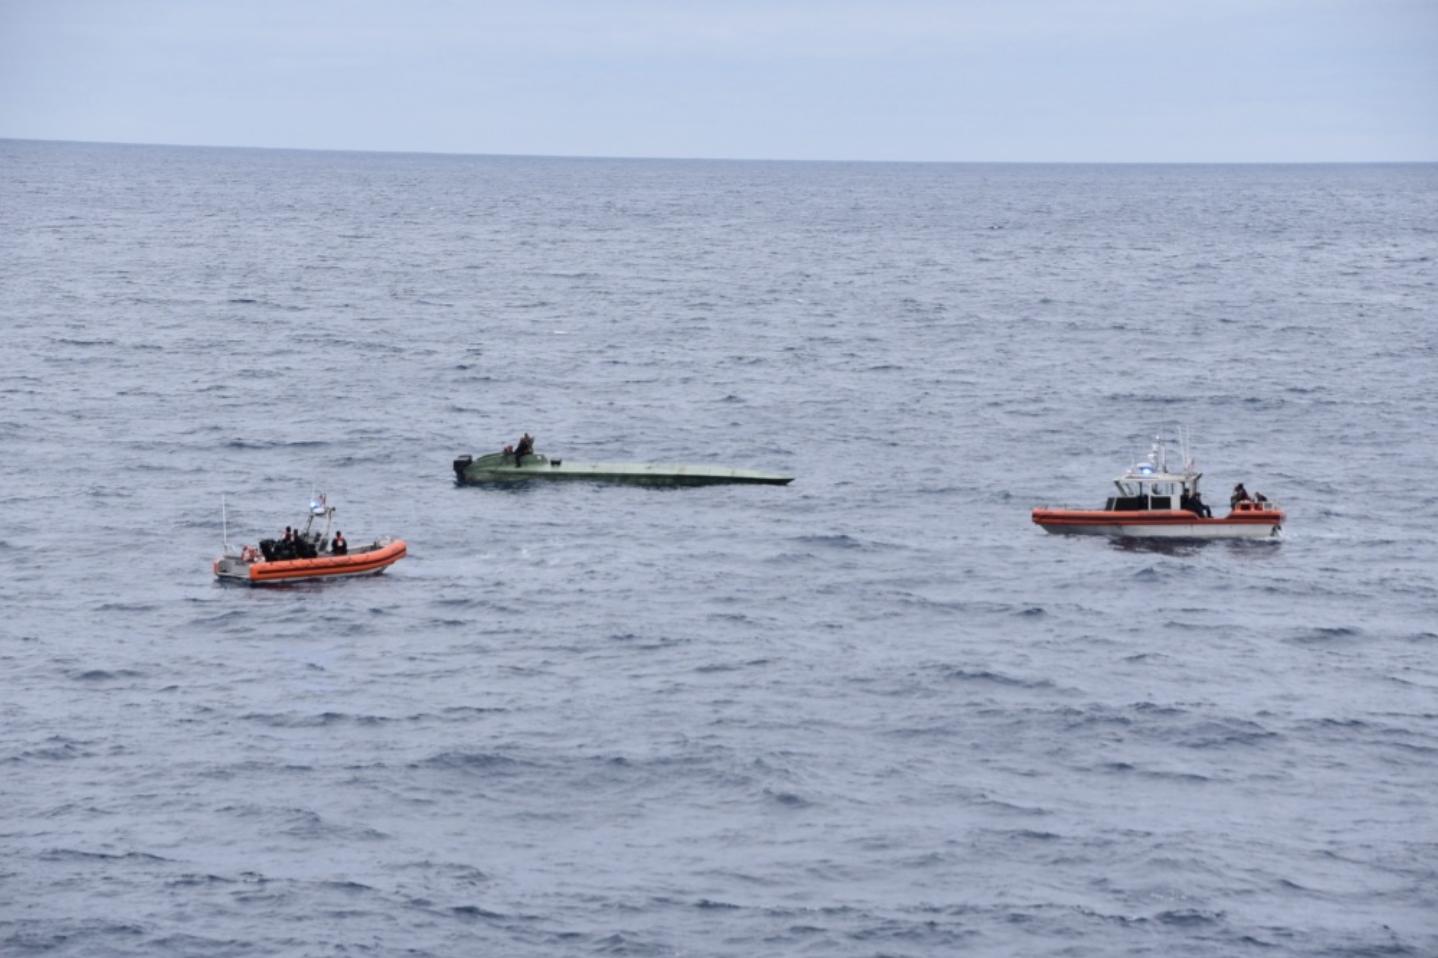 Coast Guard intercepts semi-submersible vessel